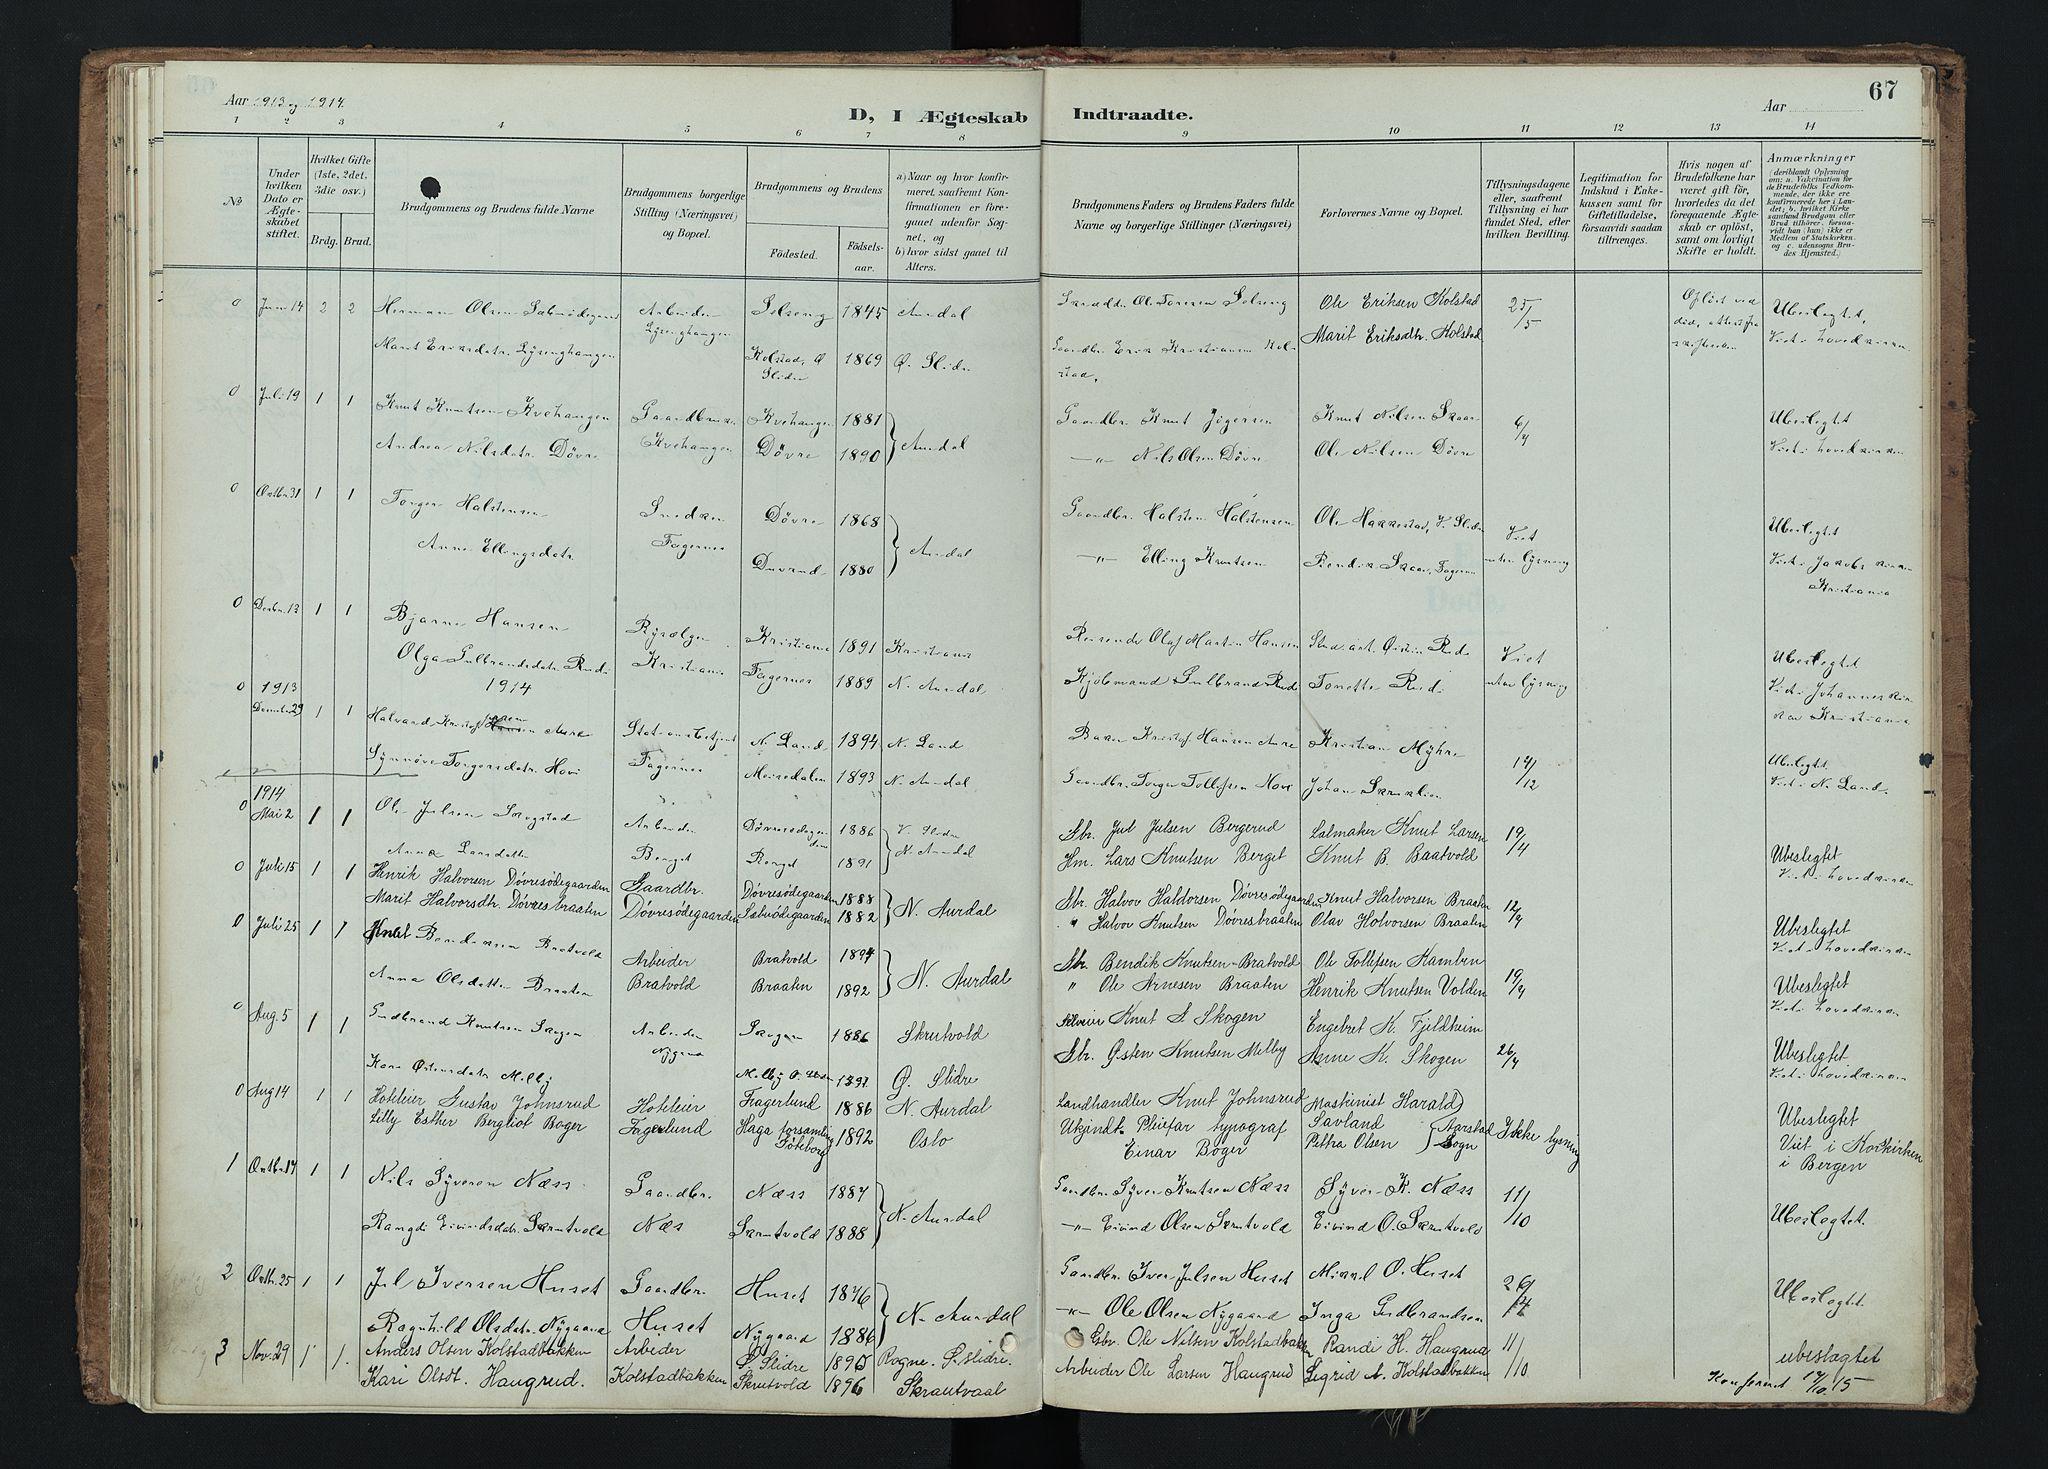 SAH, Nord-Aurdal prestekontor, Ministerialbok nr. 15, 1896-1914, s. 67